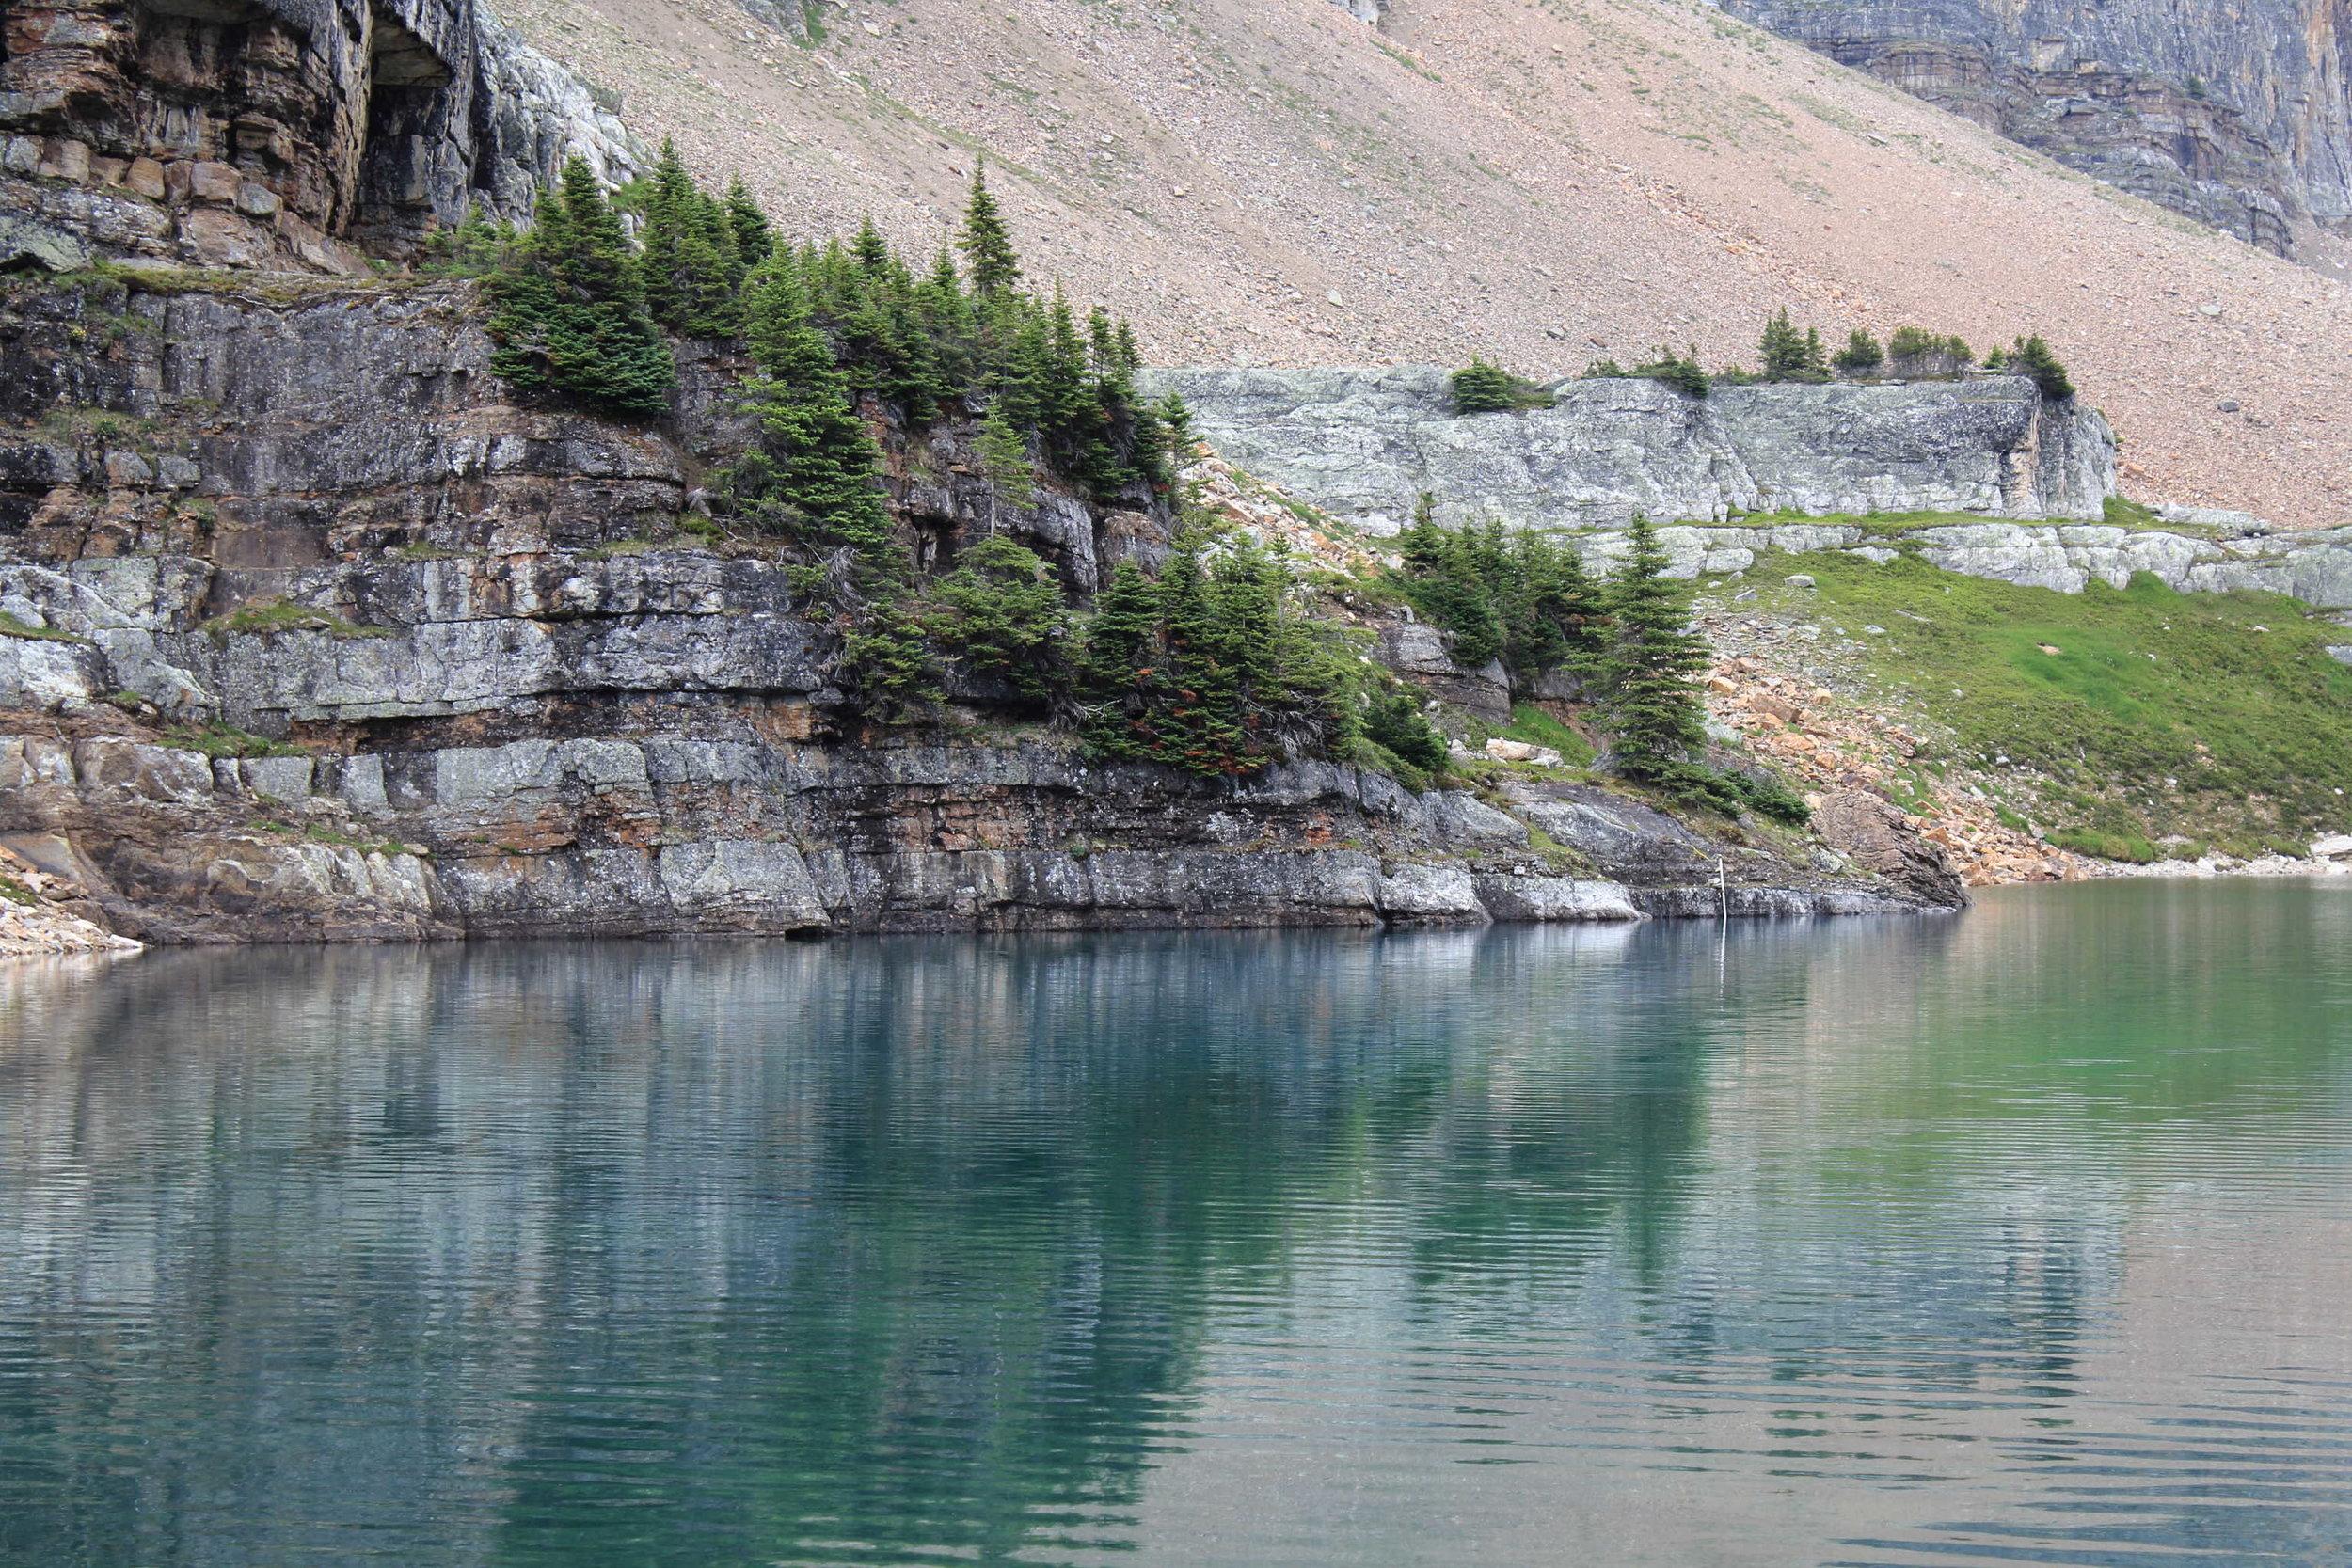 Opabin Lake, Lake O'Hara region